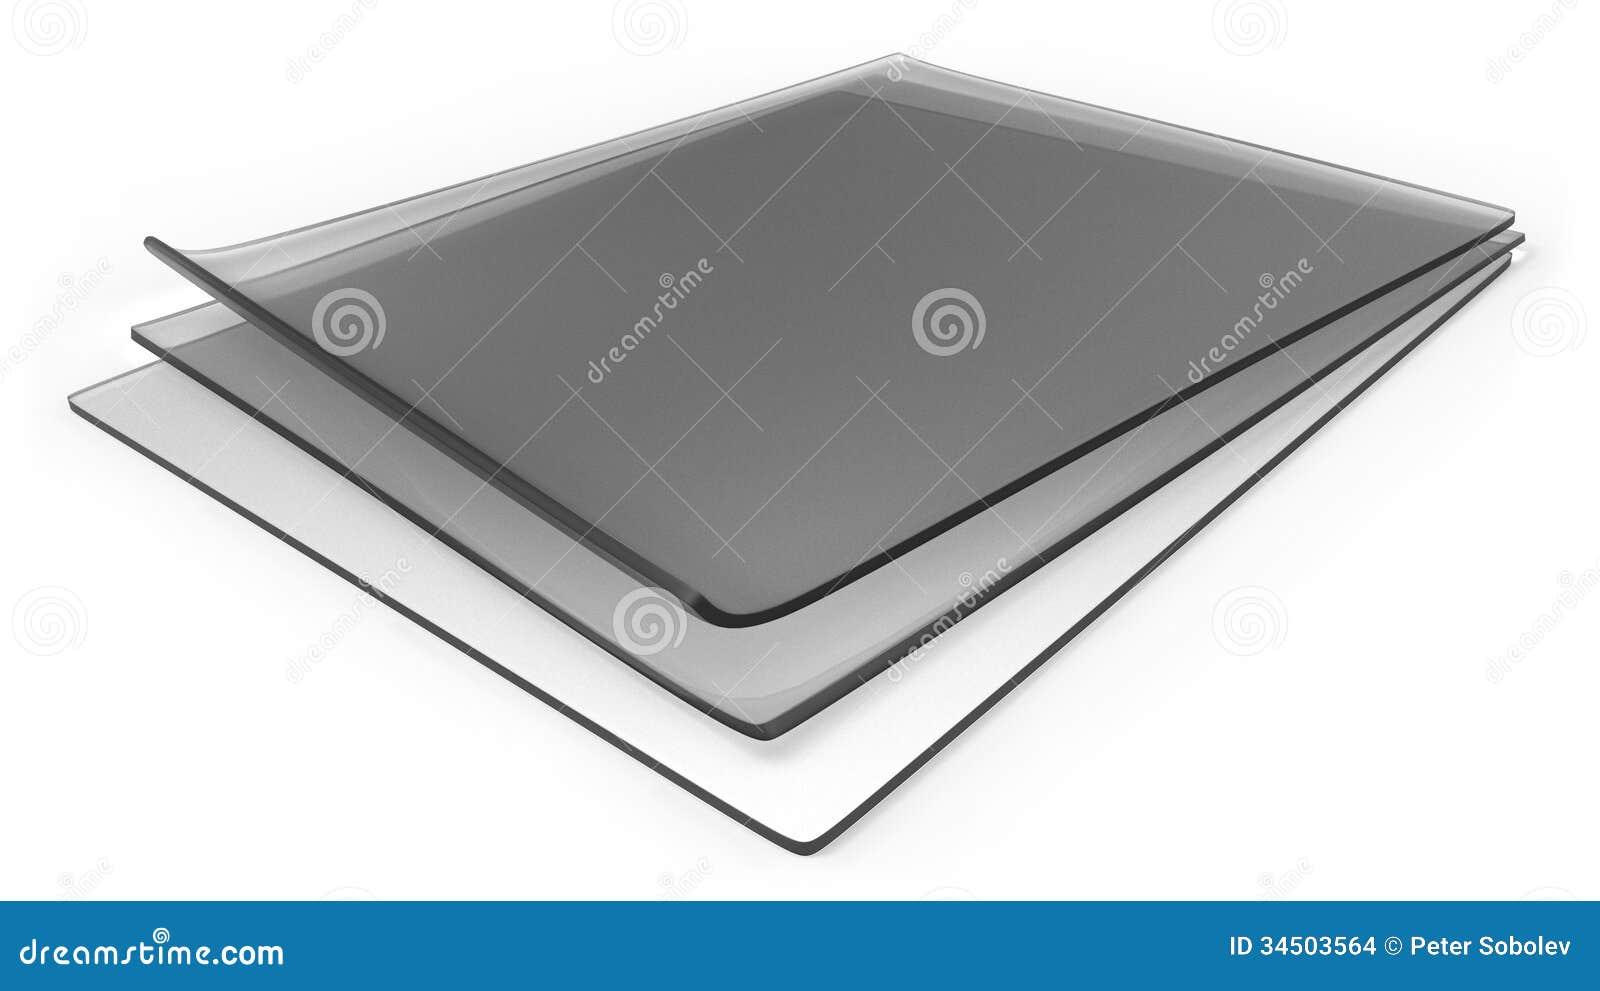 Dikke transparante silicone rubberbladen